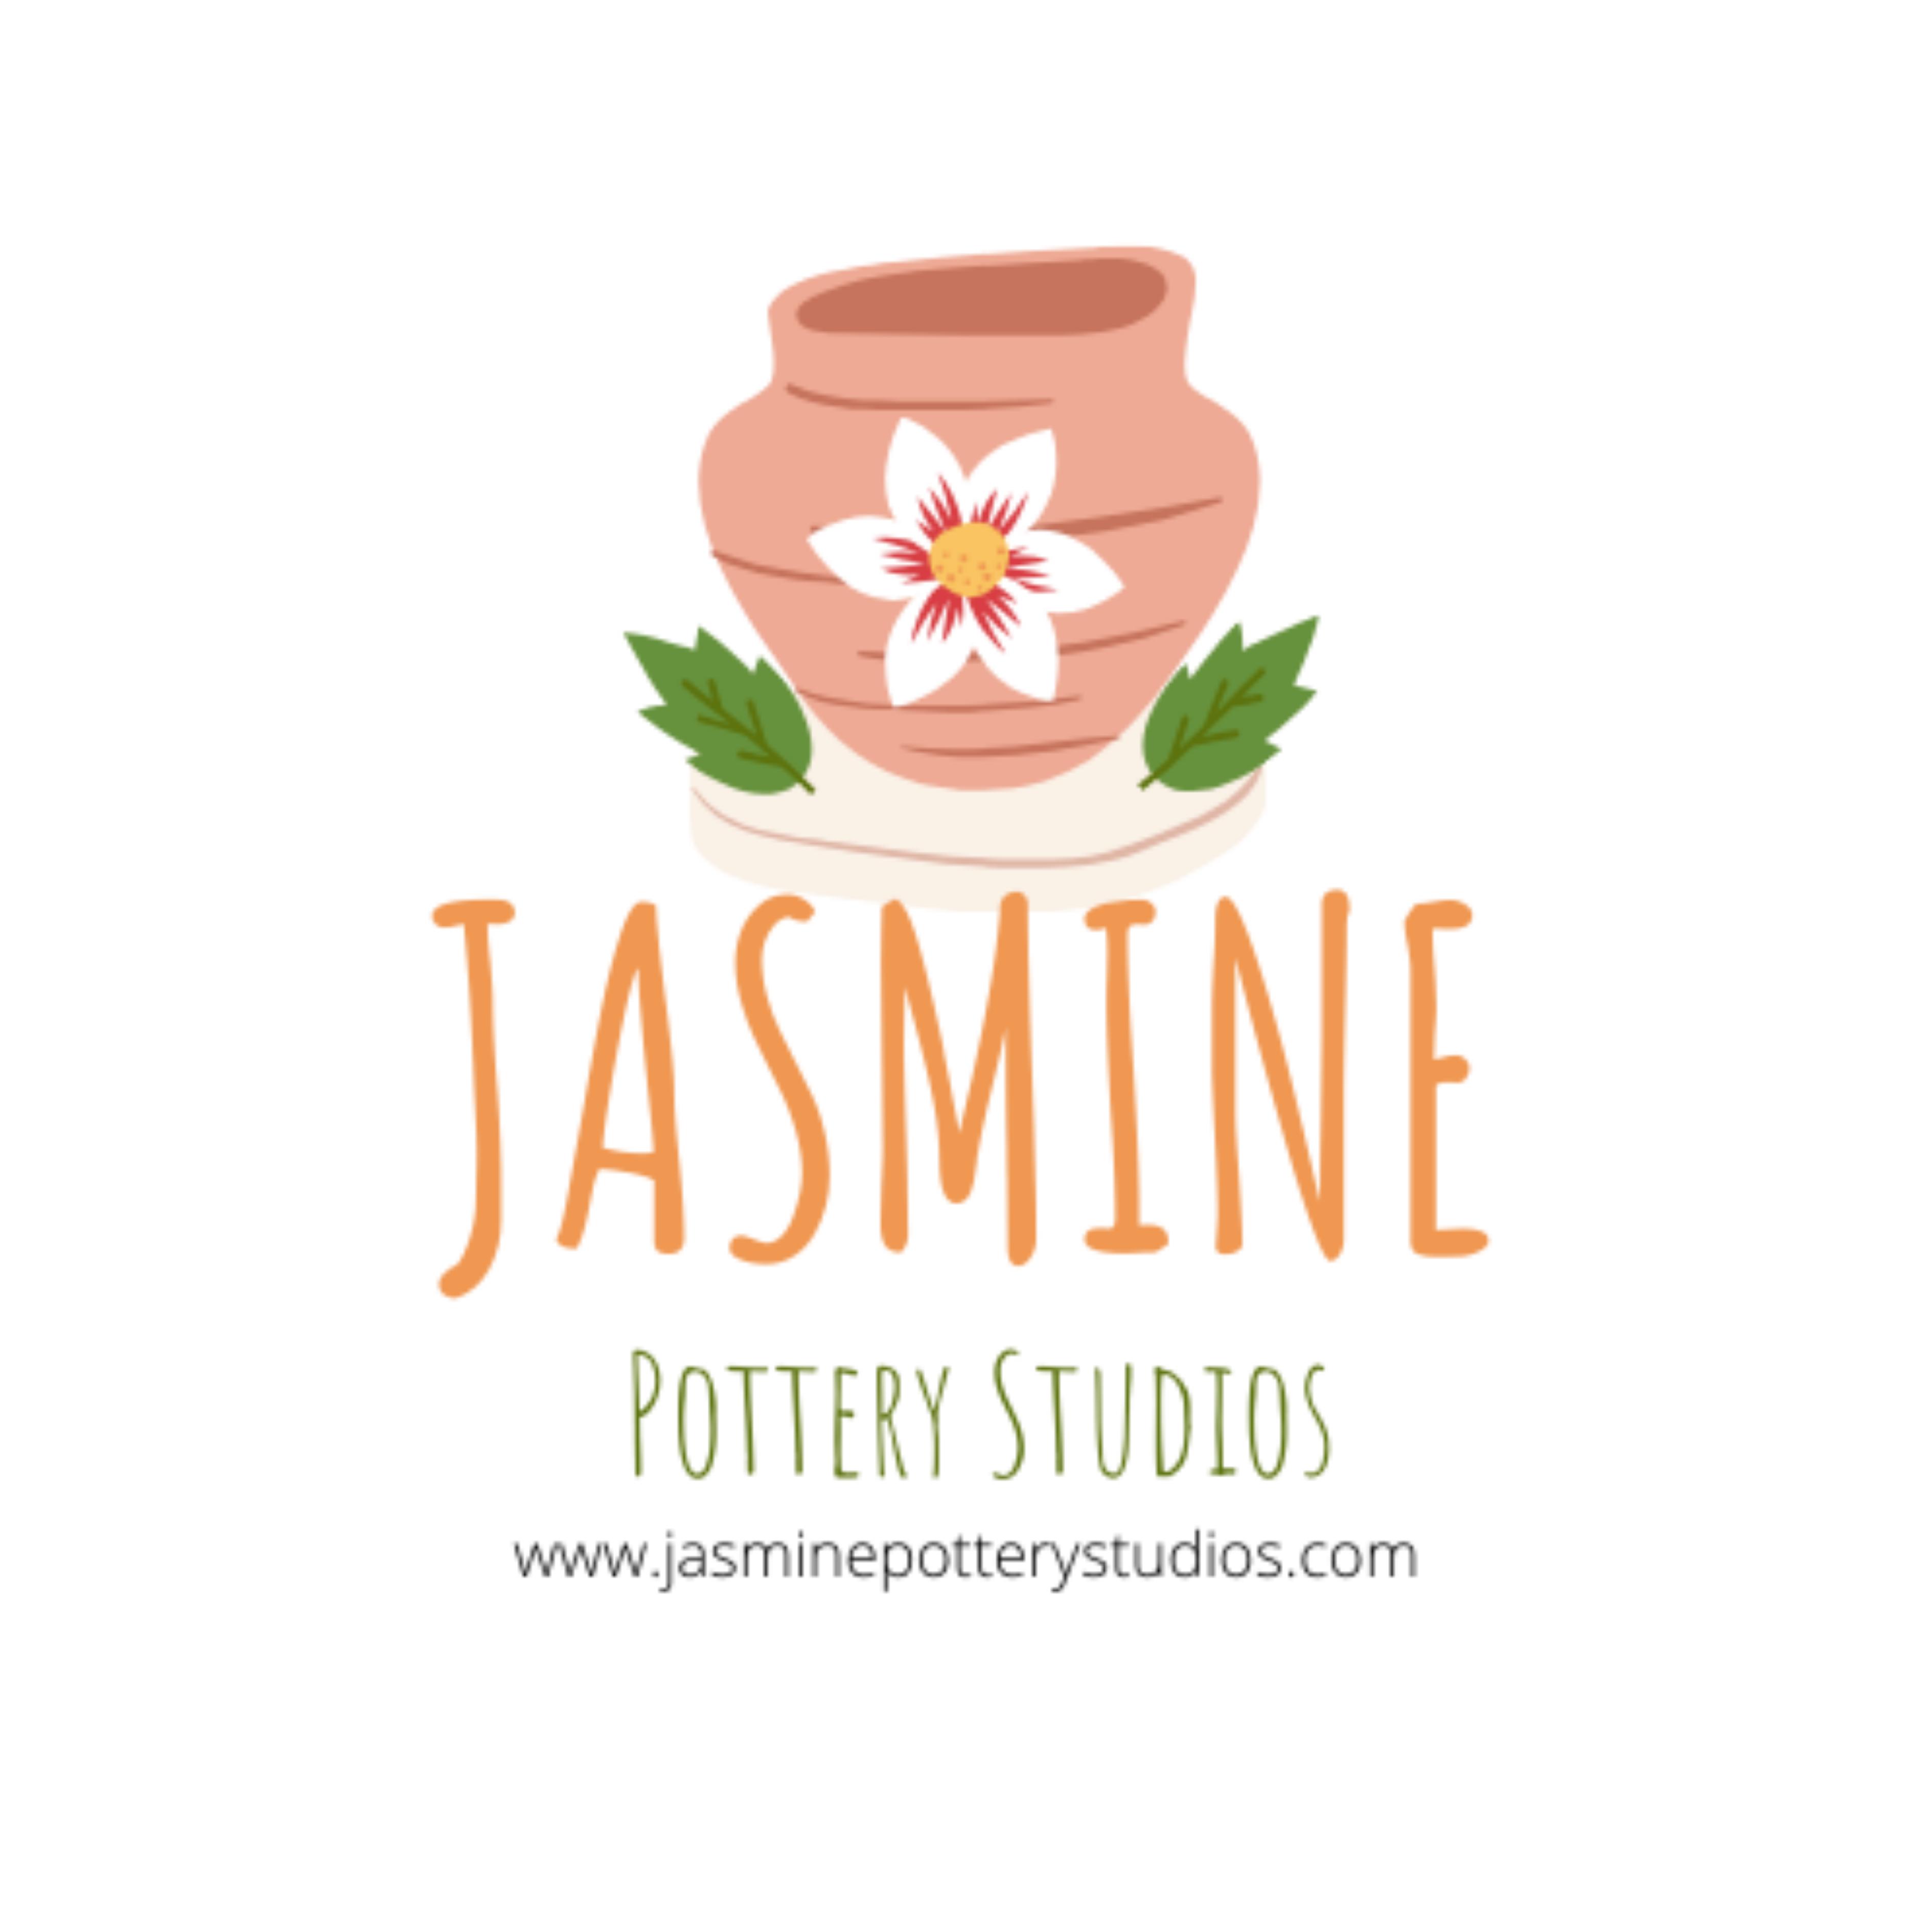 Jasmine Pottery Studios logo